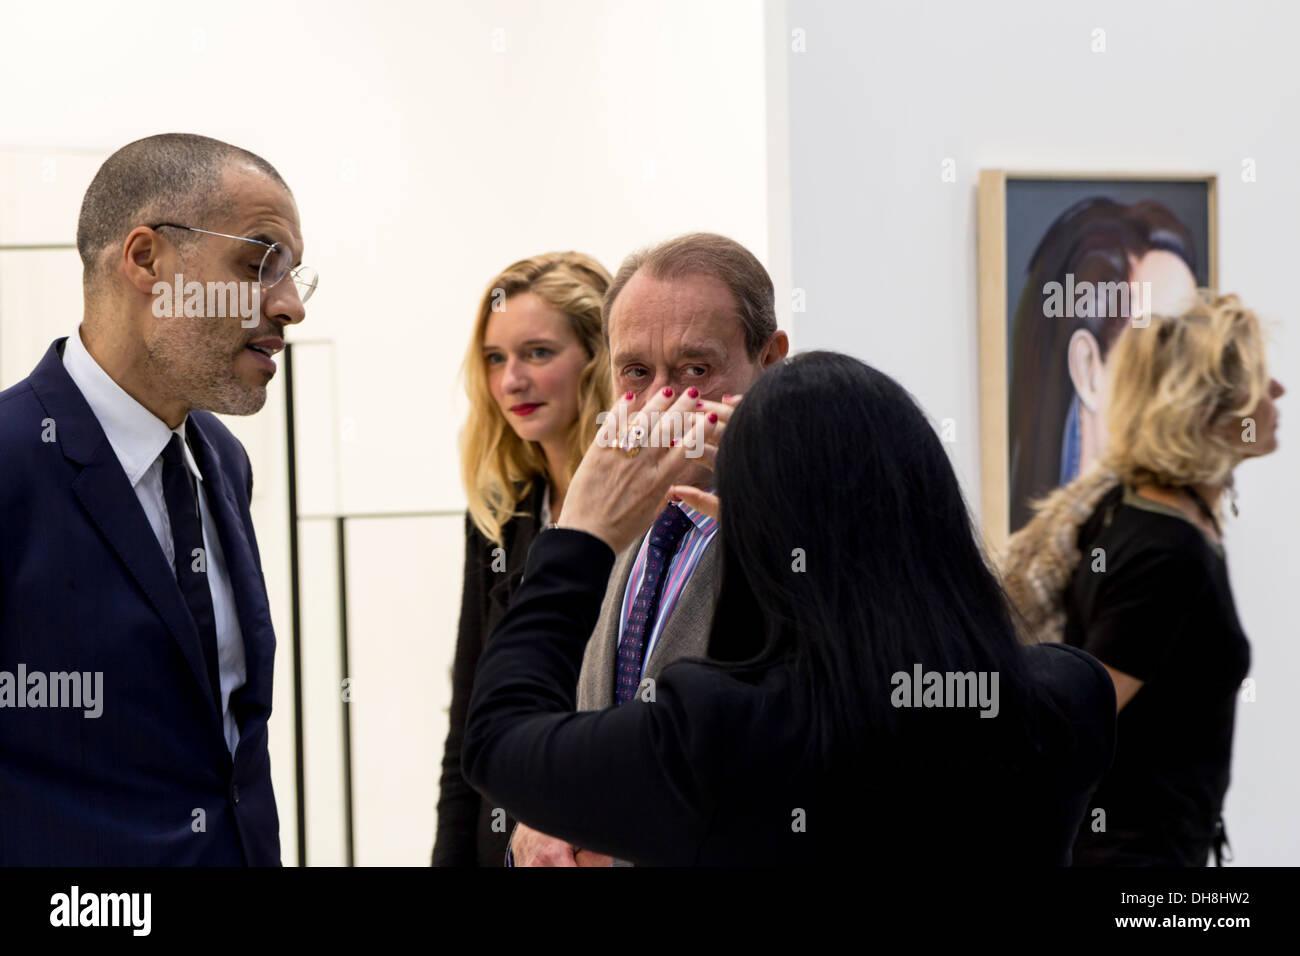 Bertrand Delanoe, french Paris Mayor visiting the Fiac 2013 (contemporary art fair) at le Grand Palais in Paris, France. - Stock Image